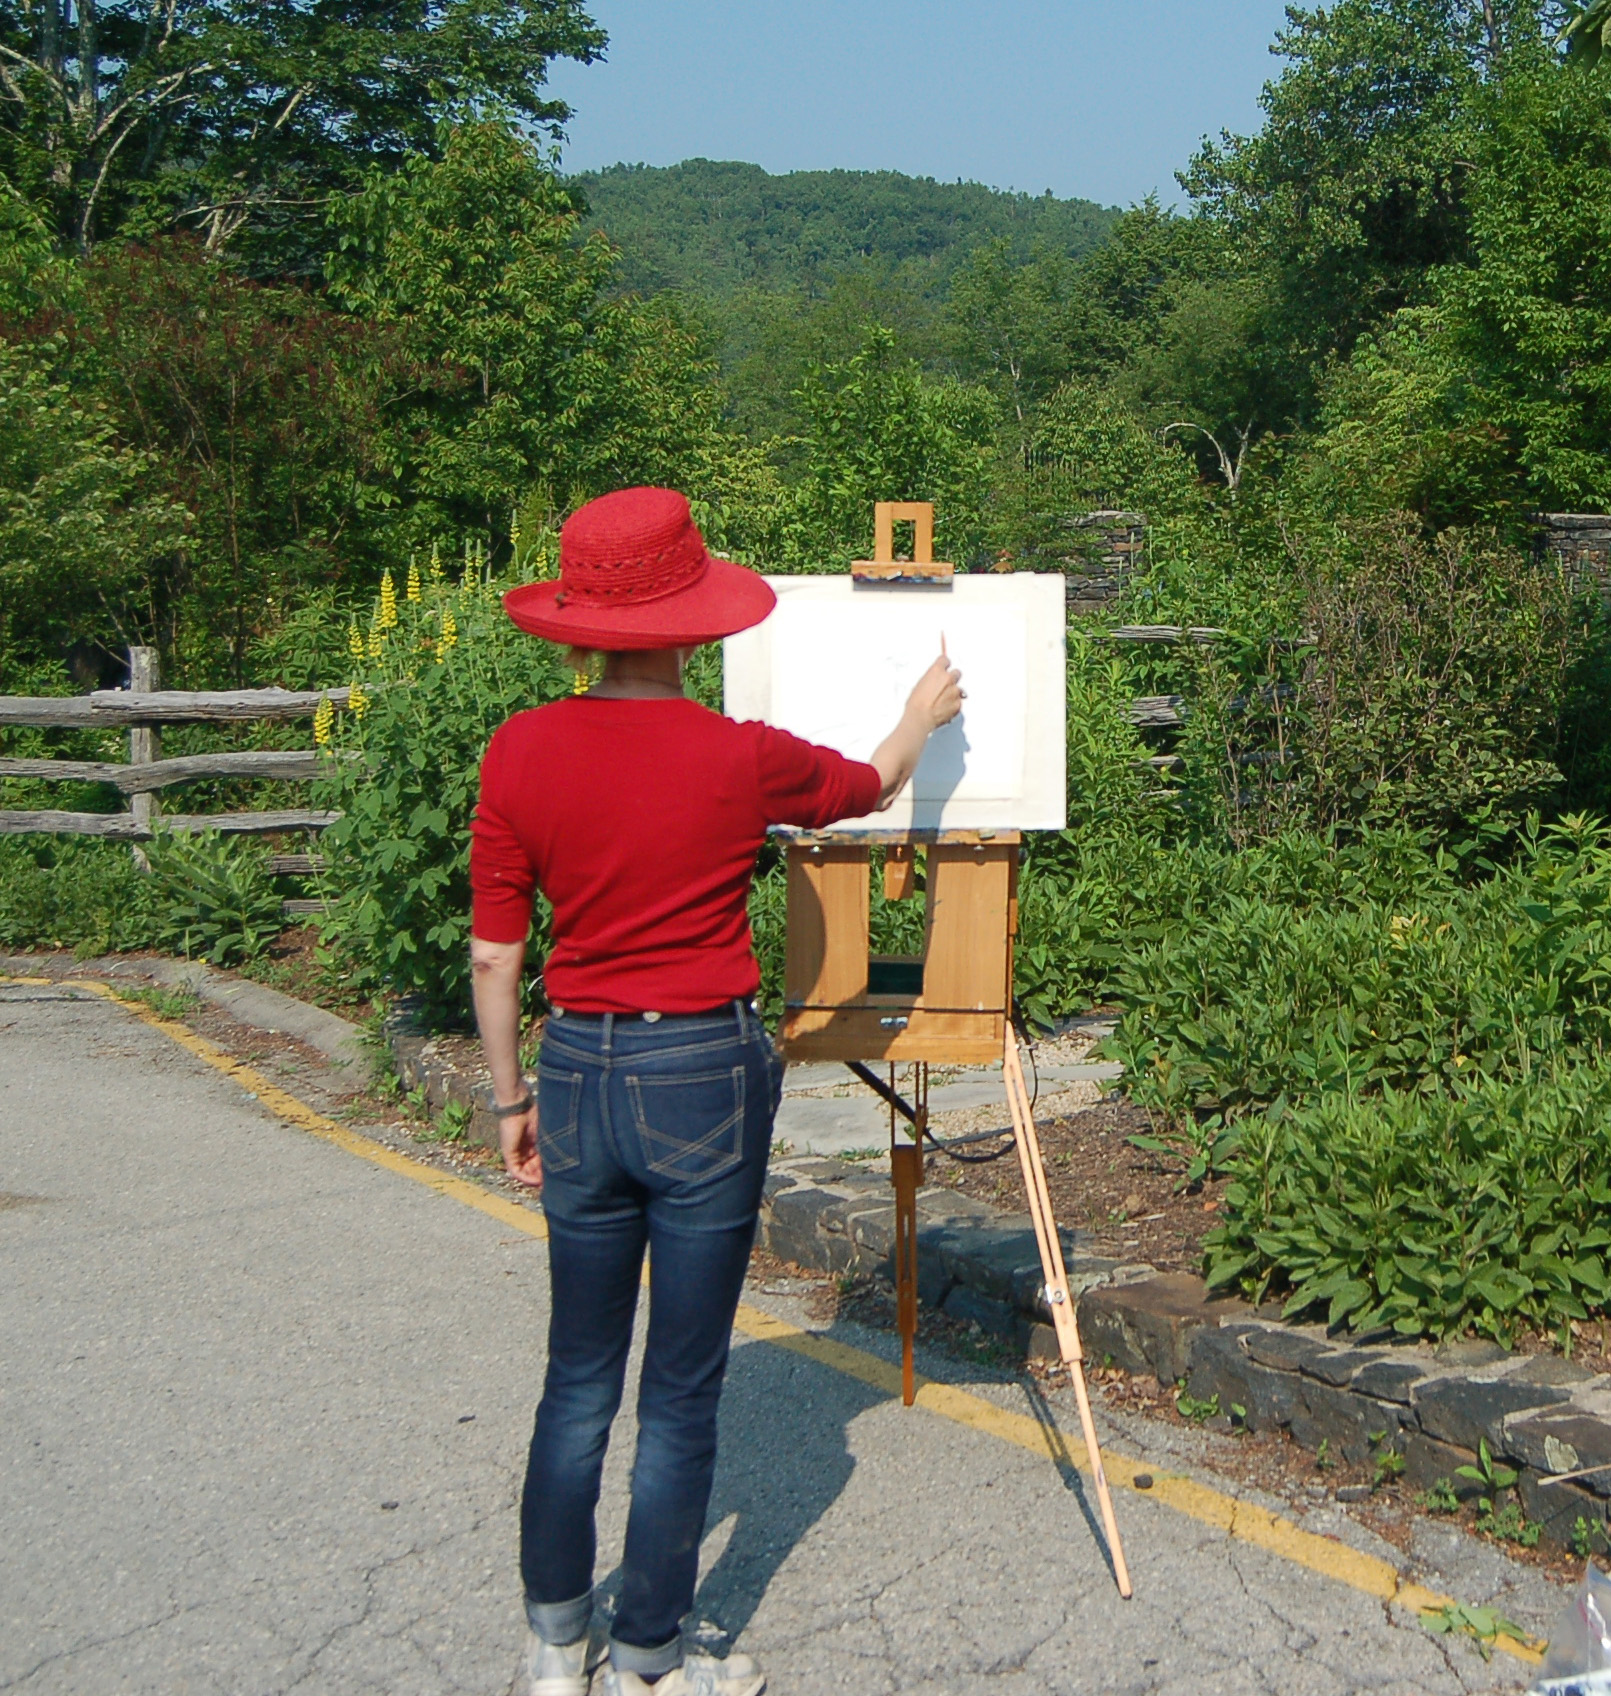 Artists enjoy Plein Air painting.